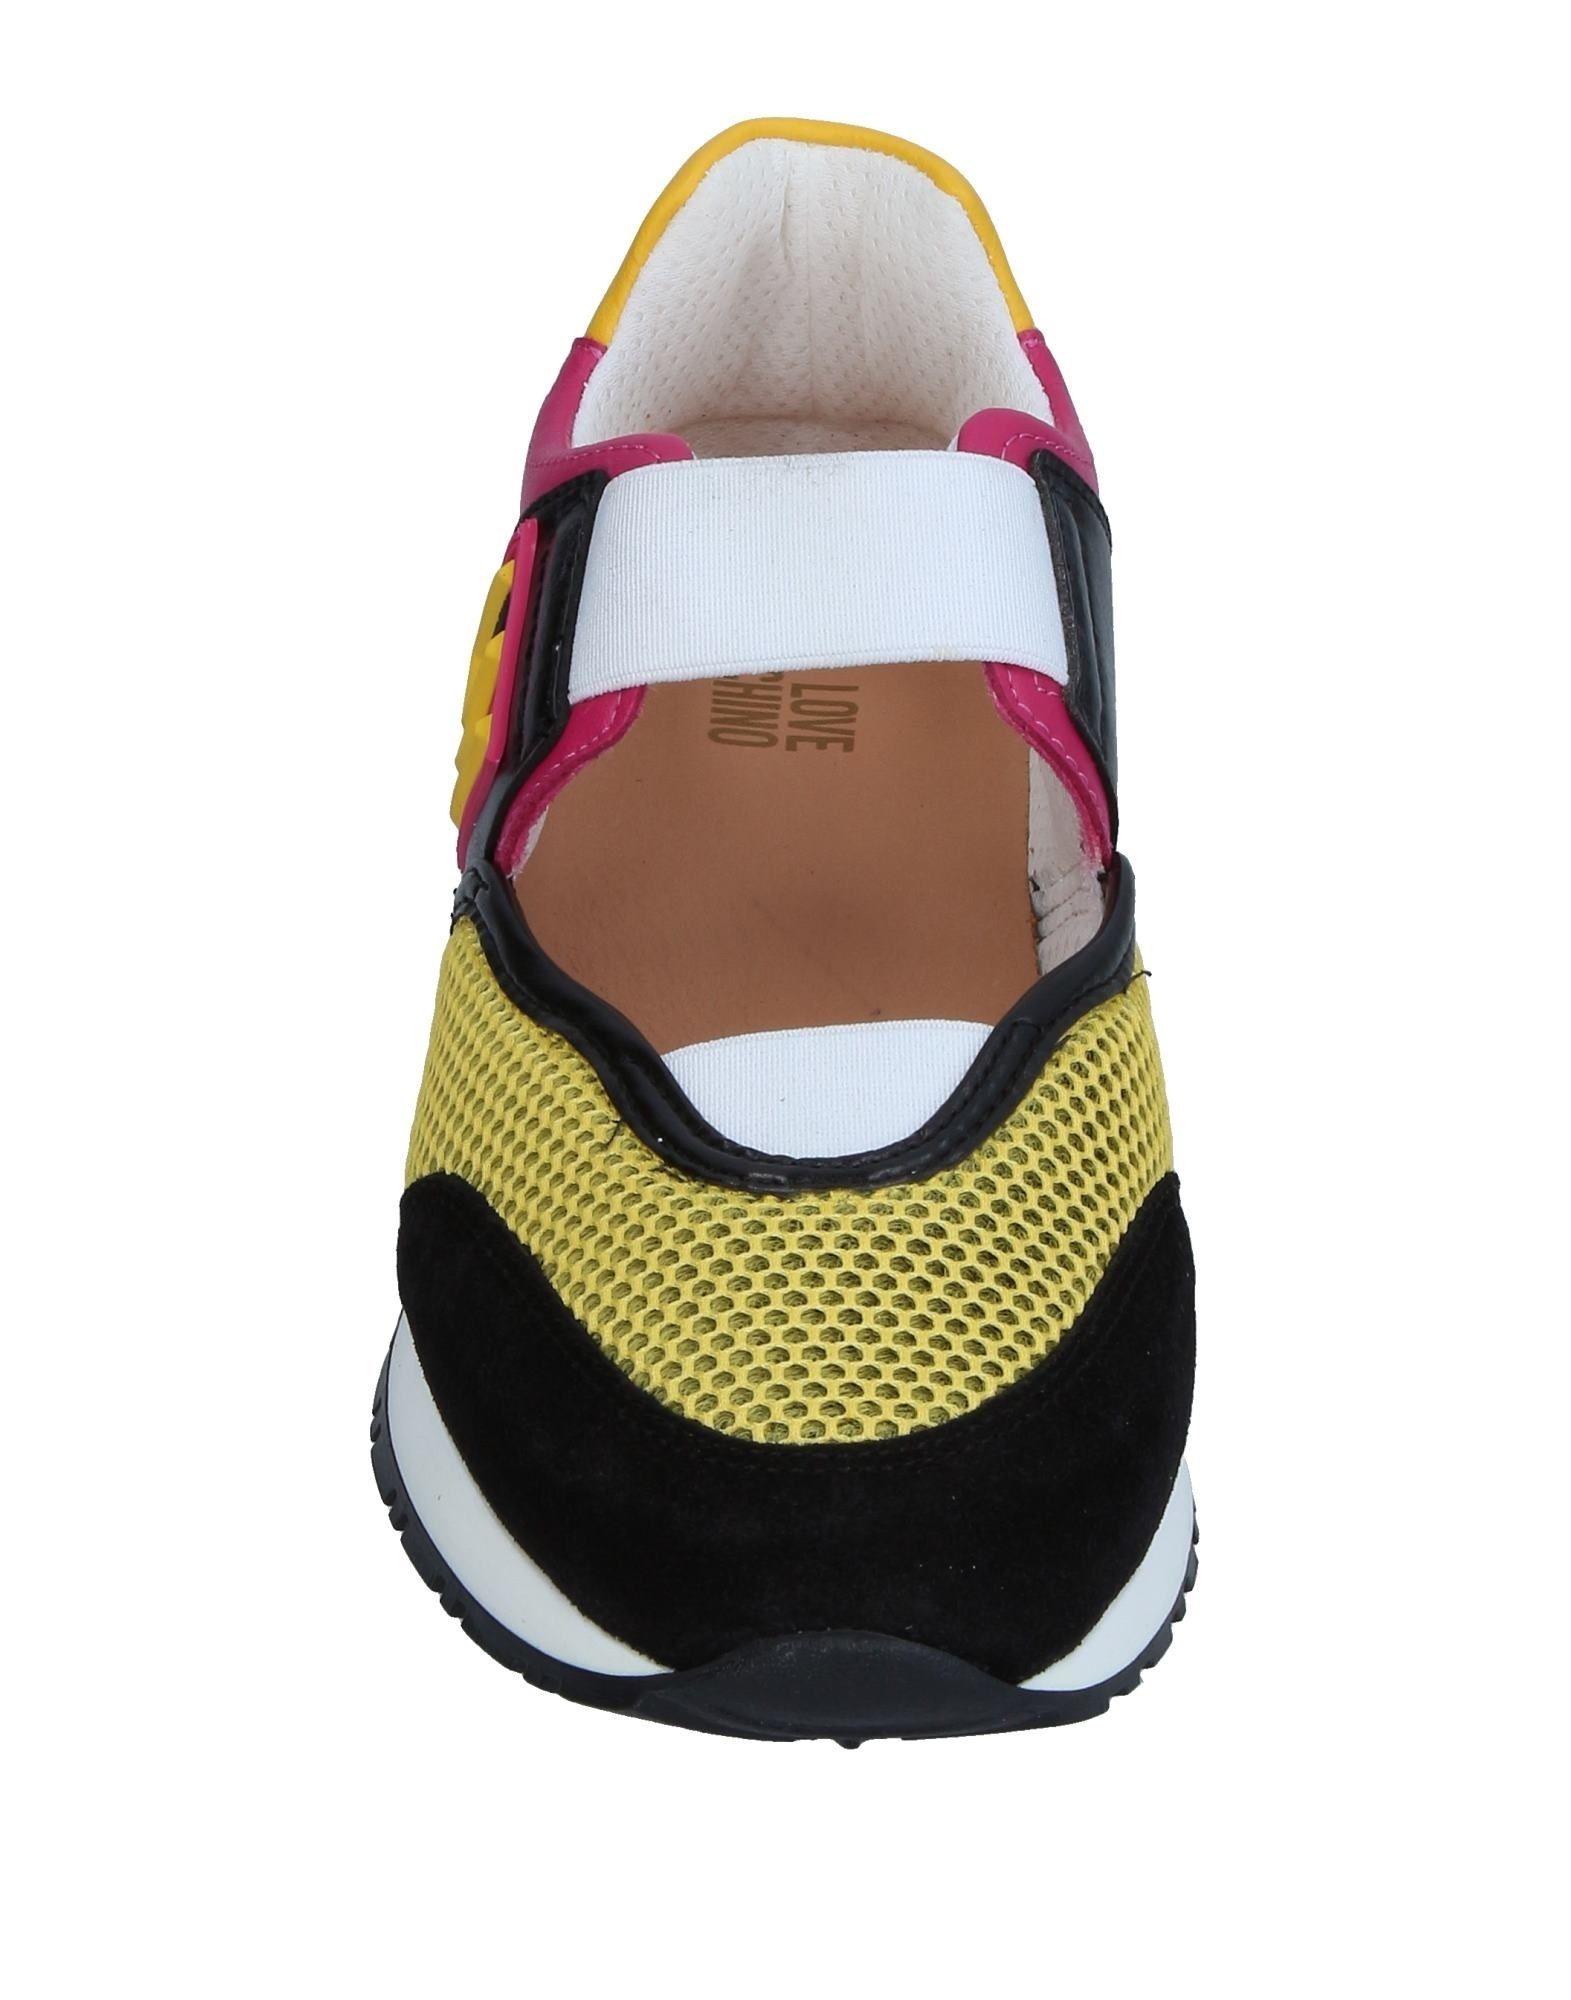 Gut um Moschino billige Schuhe zu tragenLove Moschino um Sneakers Damen  11326889VR 37e4b4